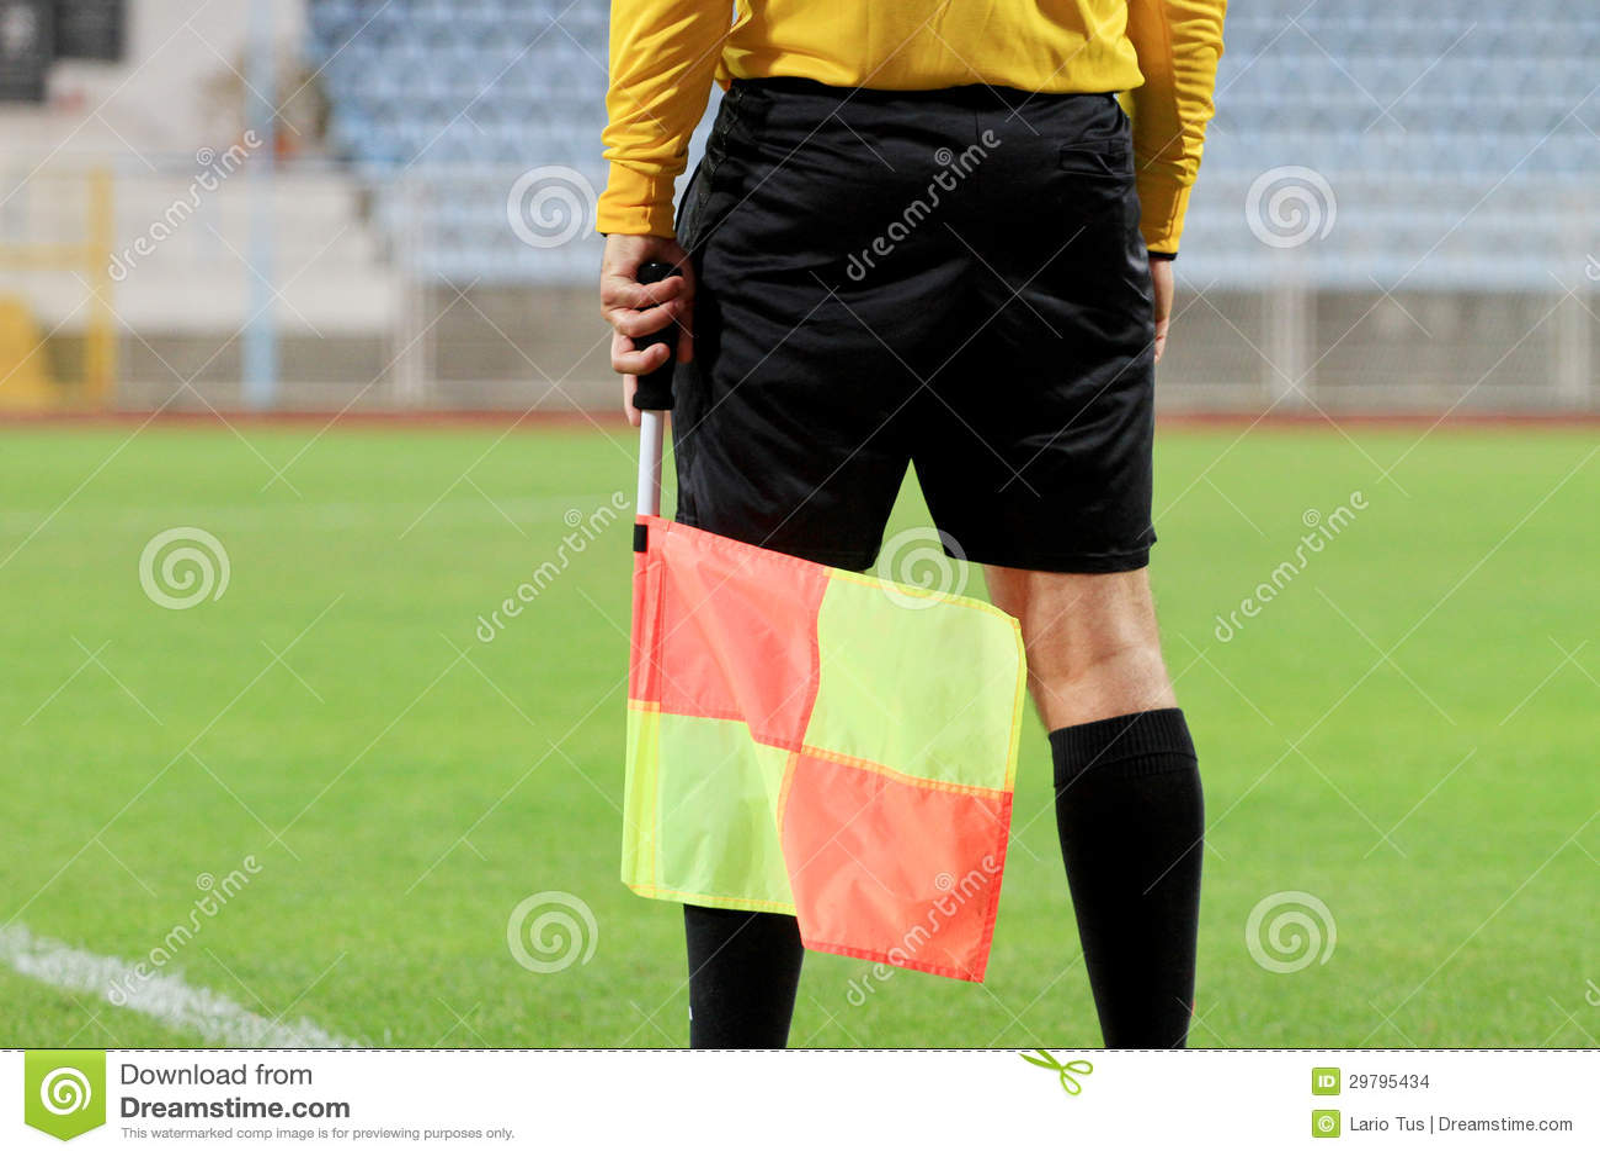 informative speech soccer referee